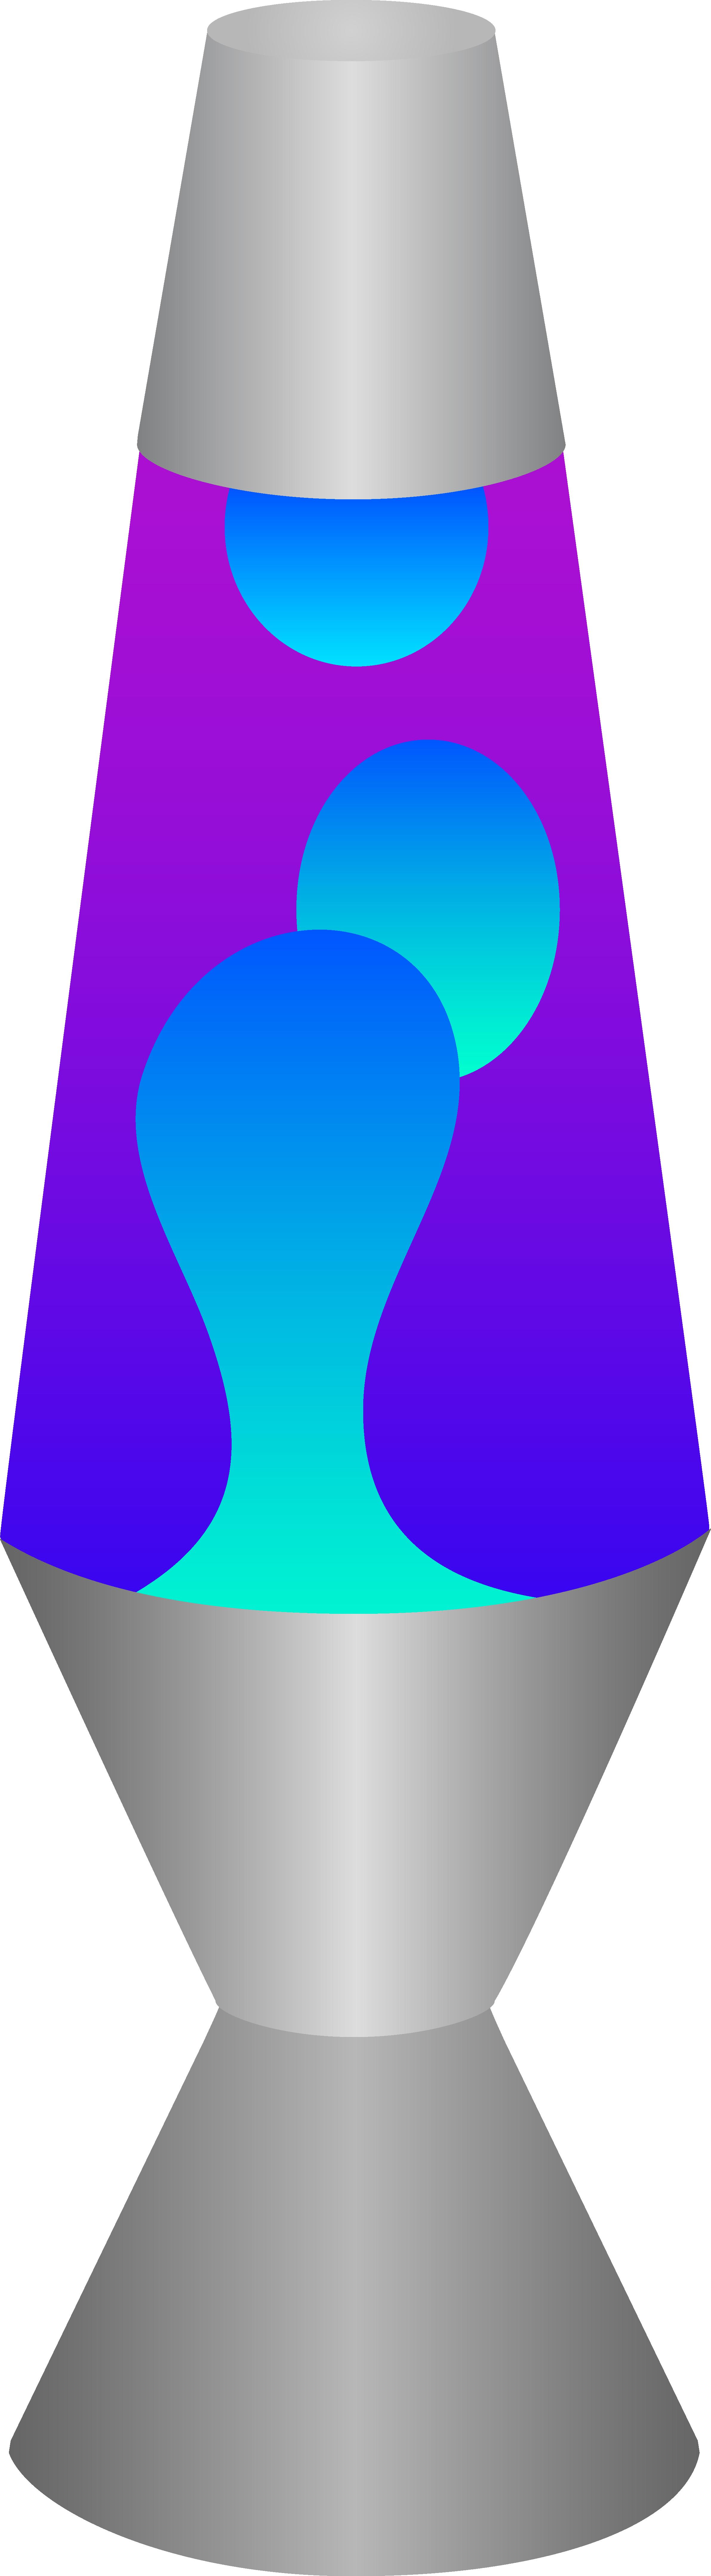 Blue and Purple Lava Lamp.